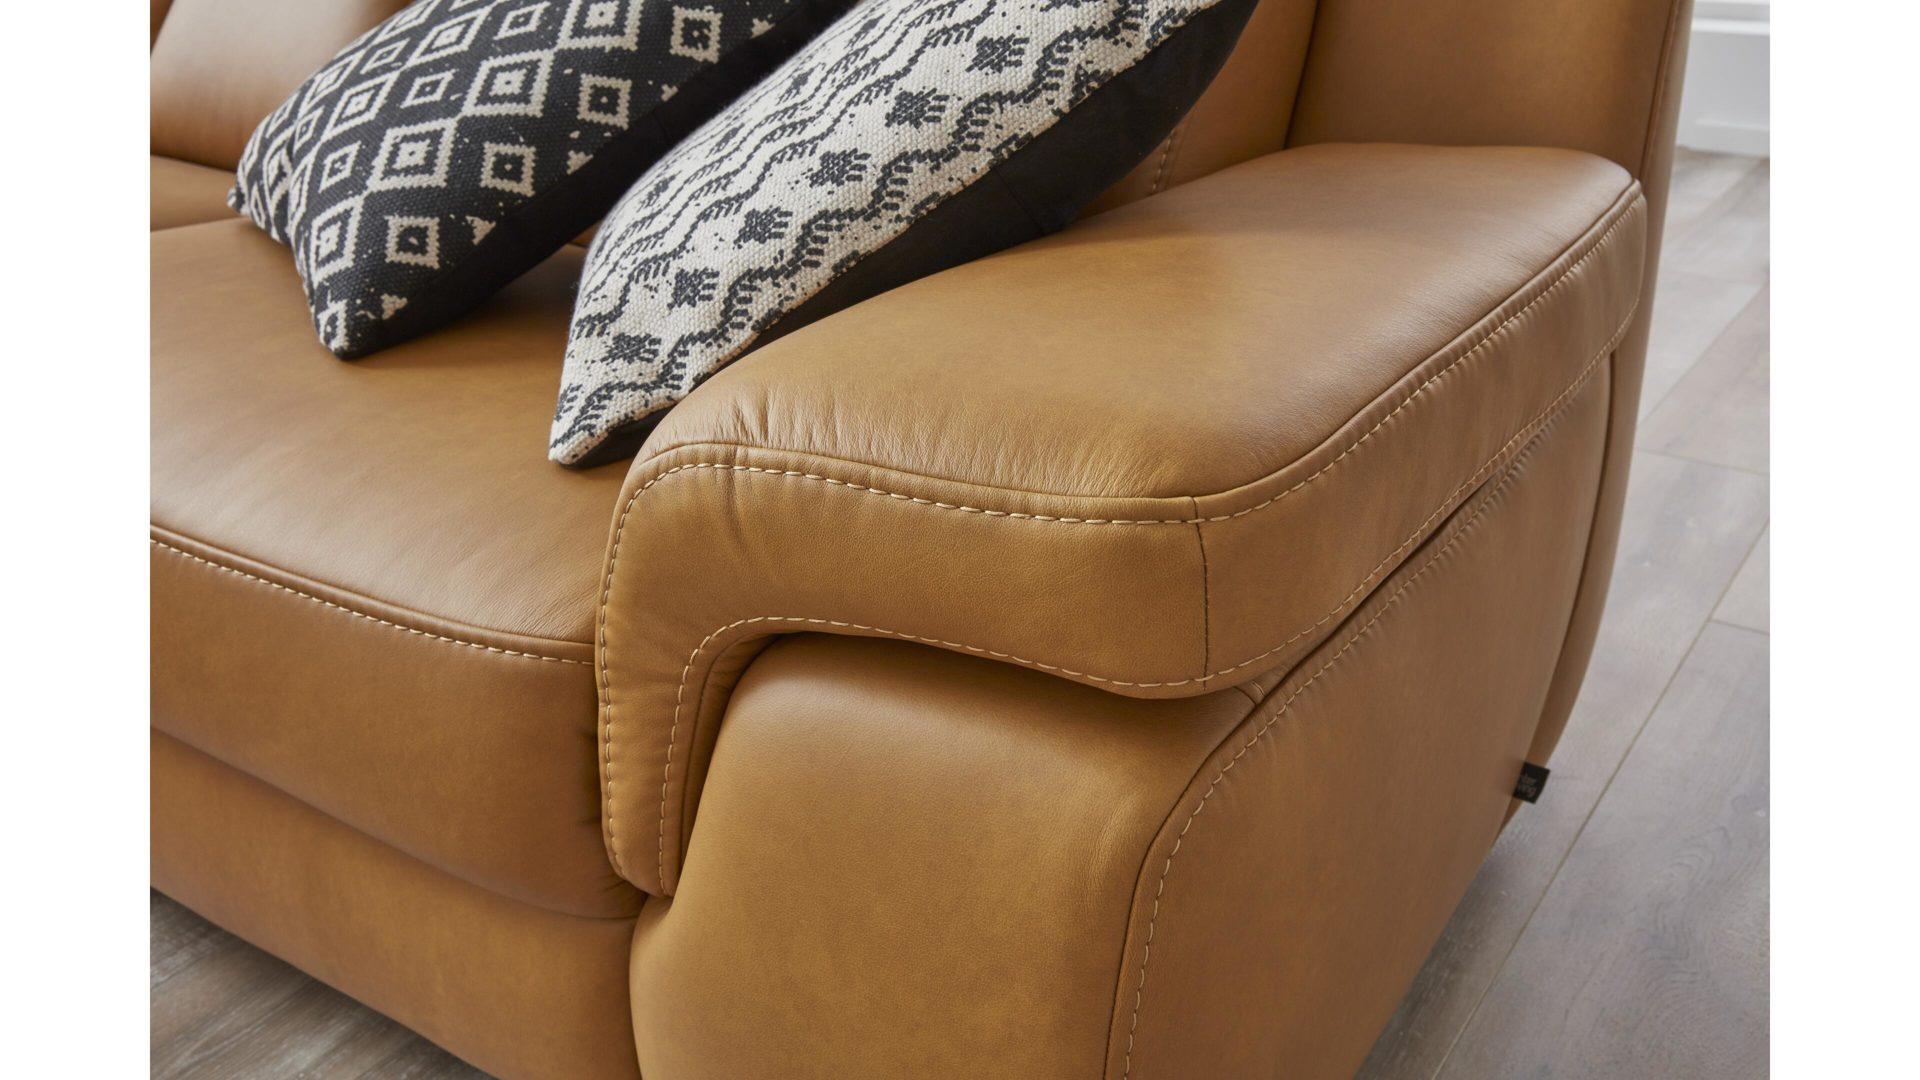 Interliving Sofa Serie 4050 Zweisitzer Kurkumafarbenes Longlife